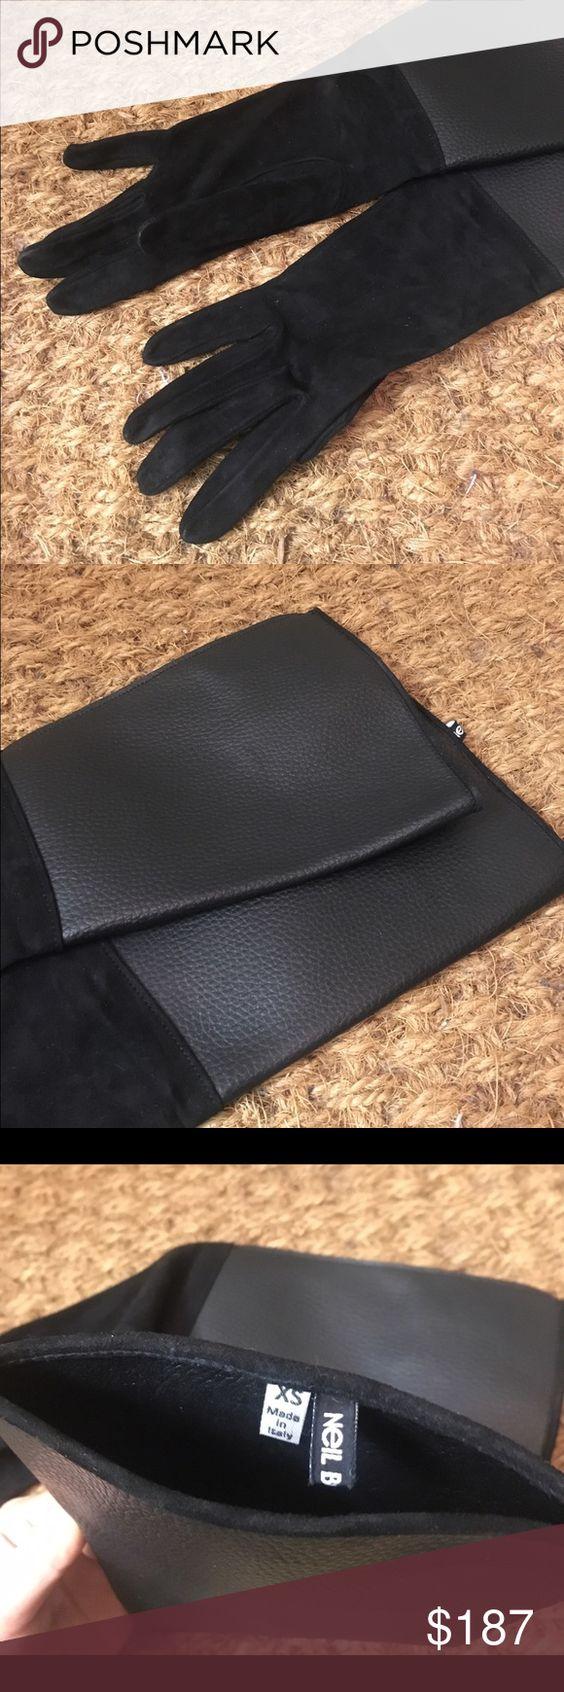 Xs black leather gloves - Neil Barrett Black Leather Gloves Brand New Neil Barrett Gloves With Two Types Of Leather